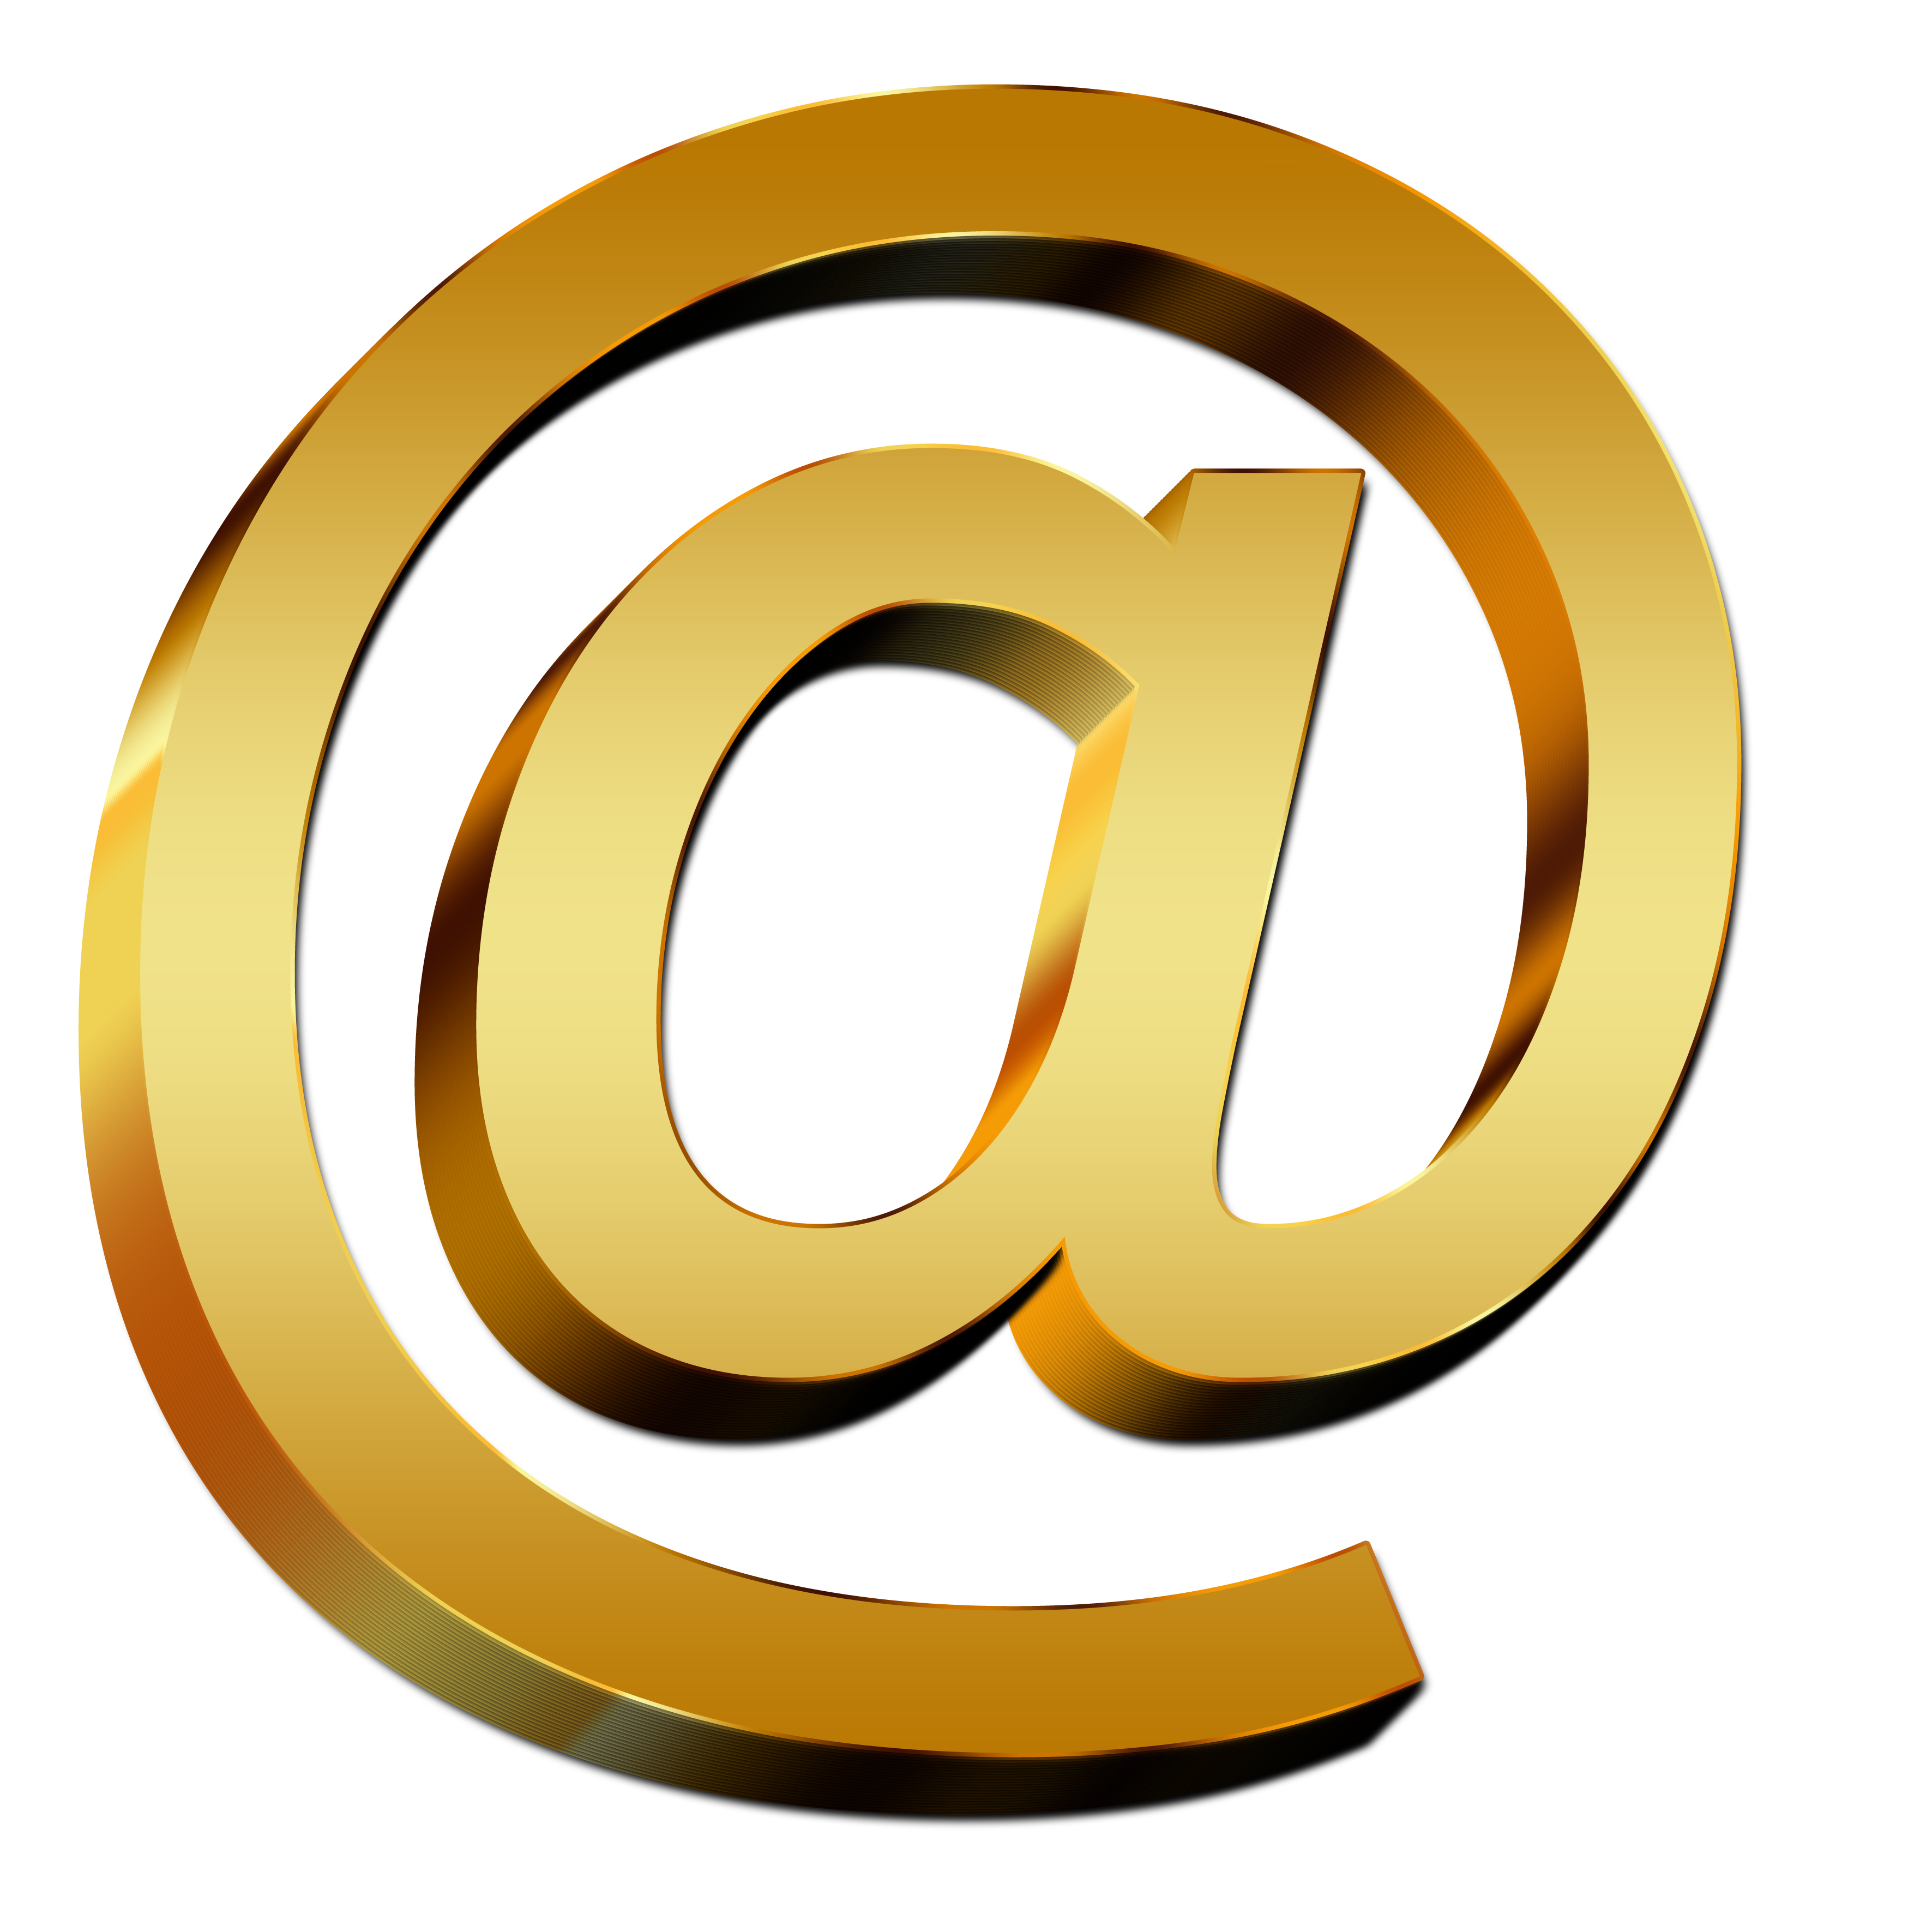 ईमेल email क्या है Resume writer, Cyber security, Resume